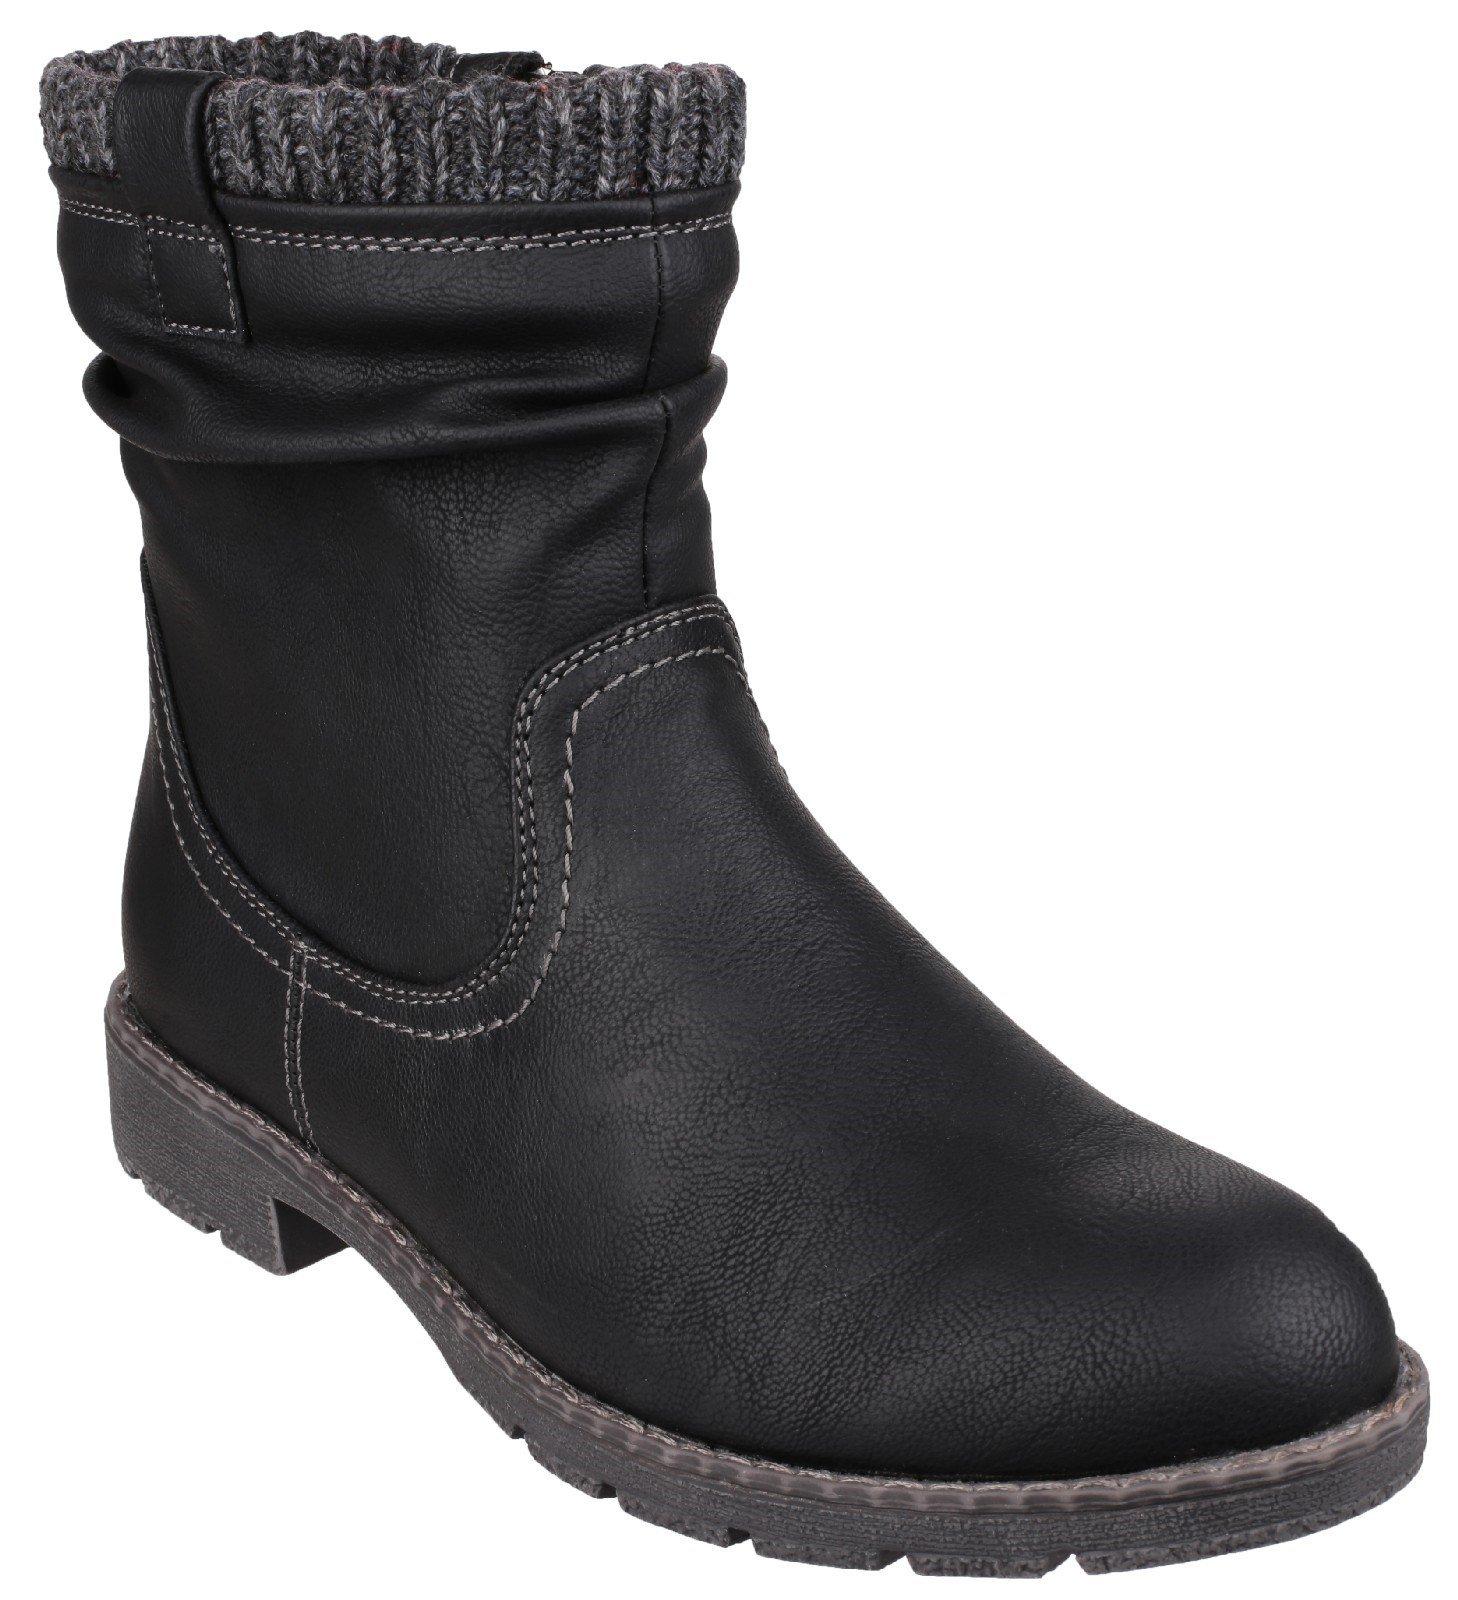 Divaz Women's Lucca Black 22812-37243 - Black 3